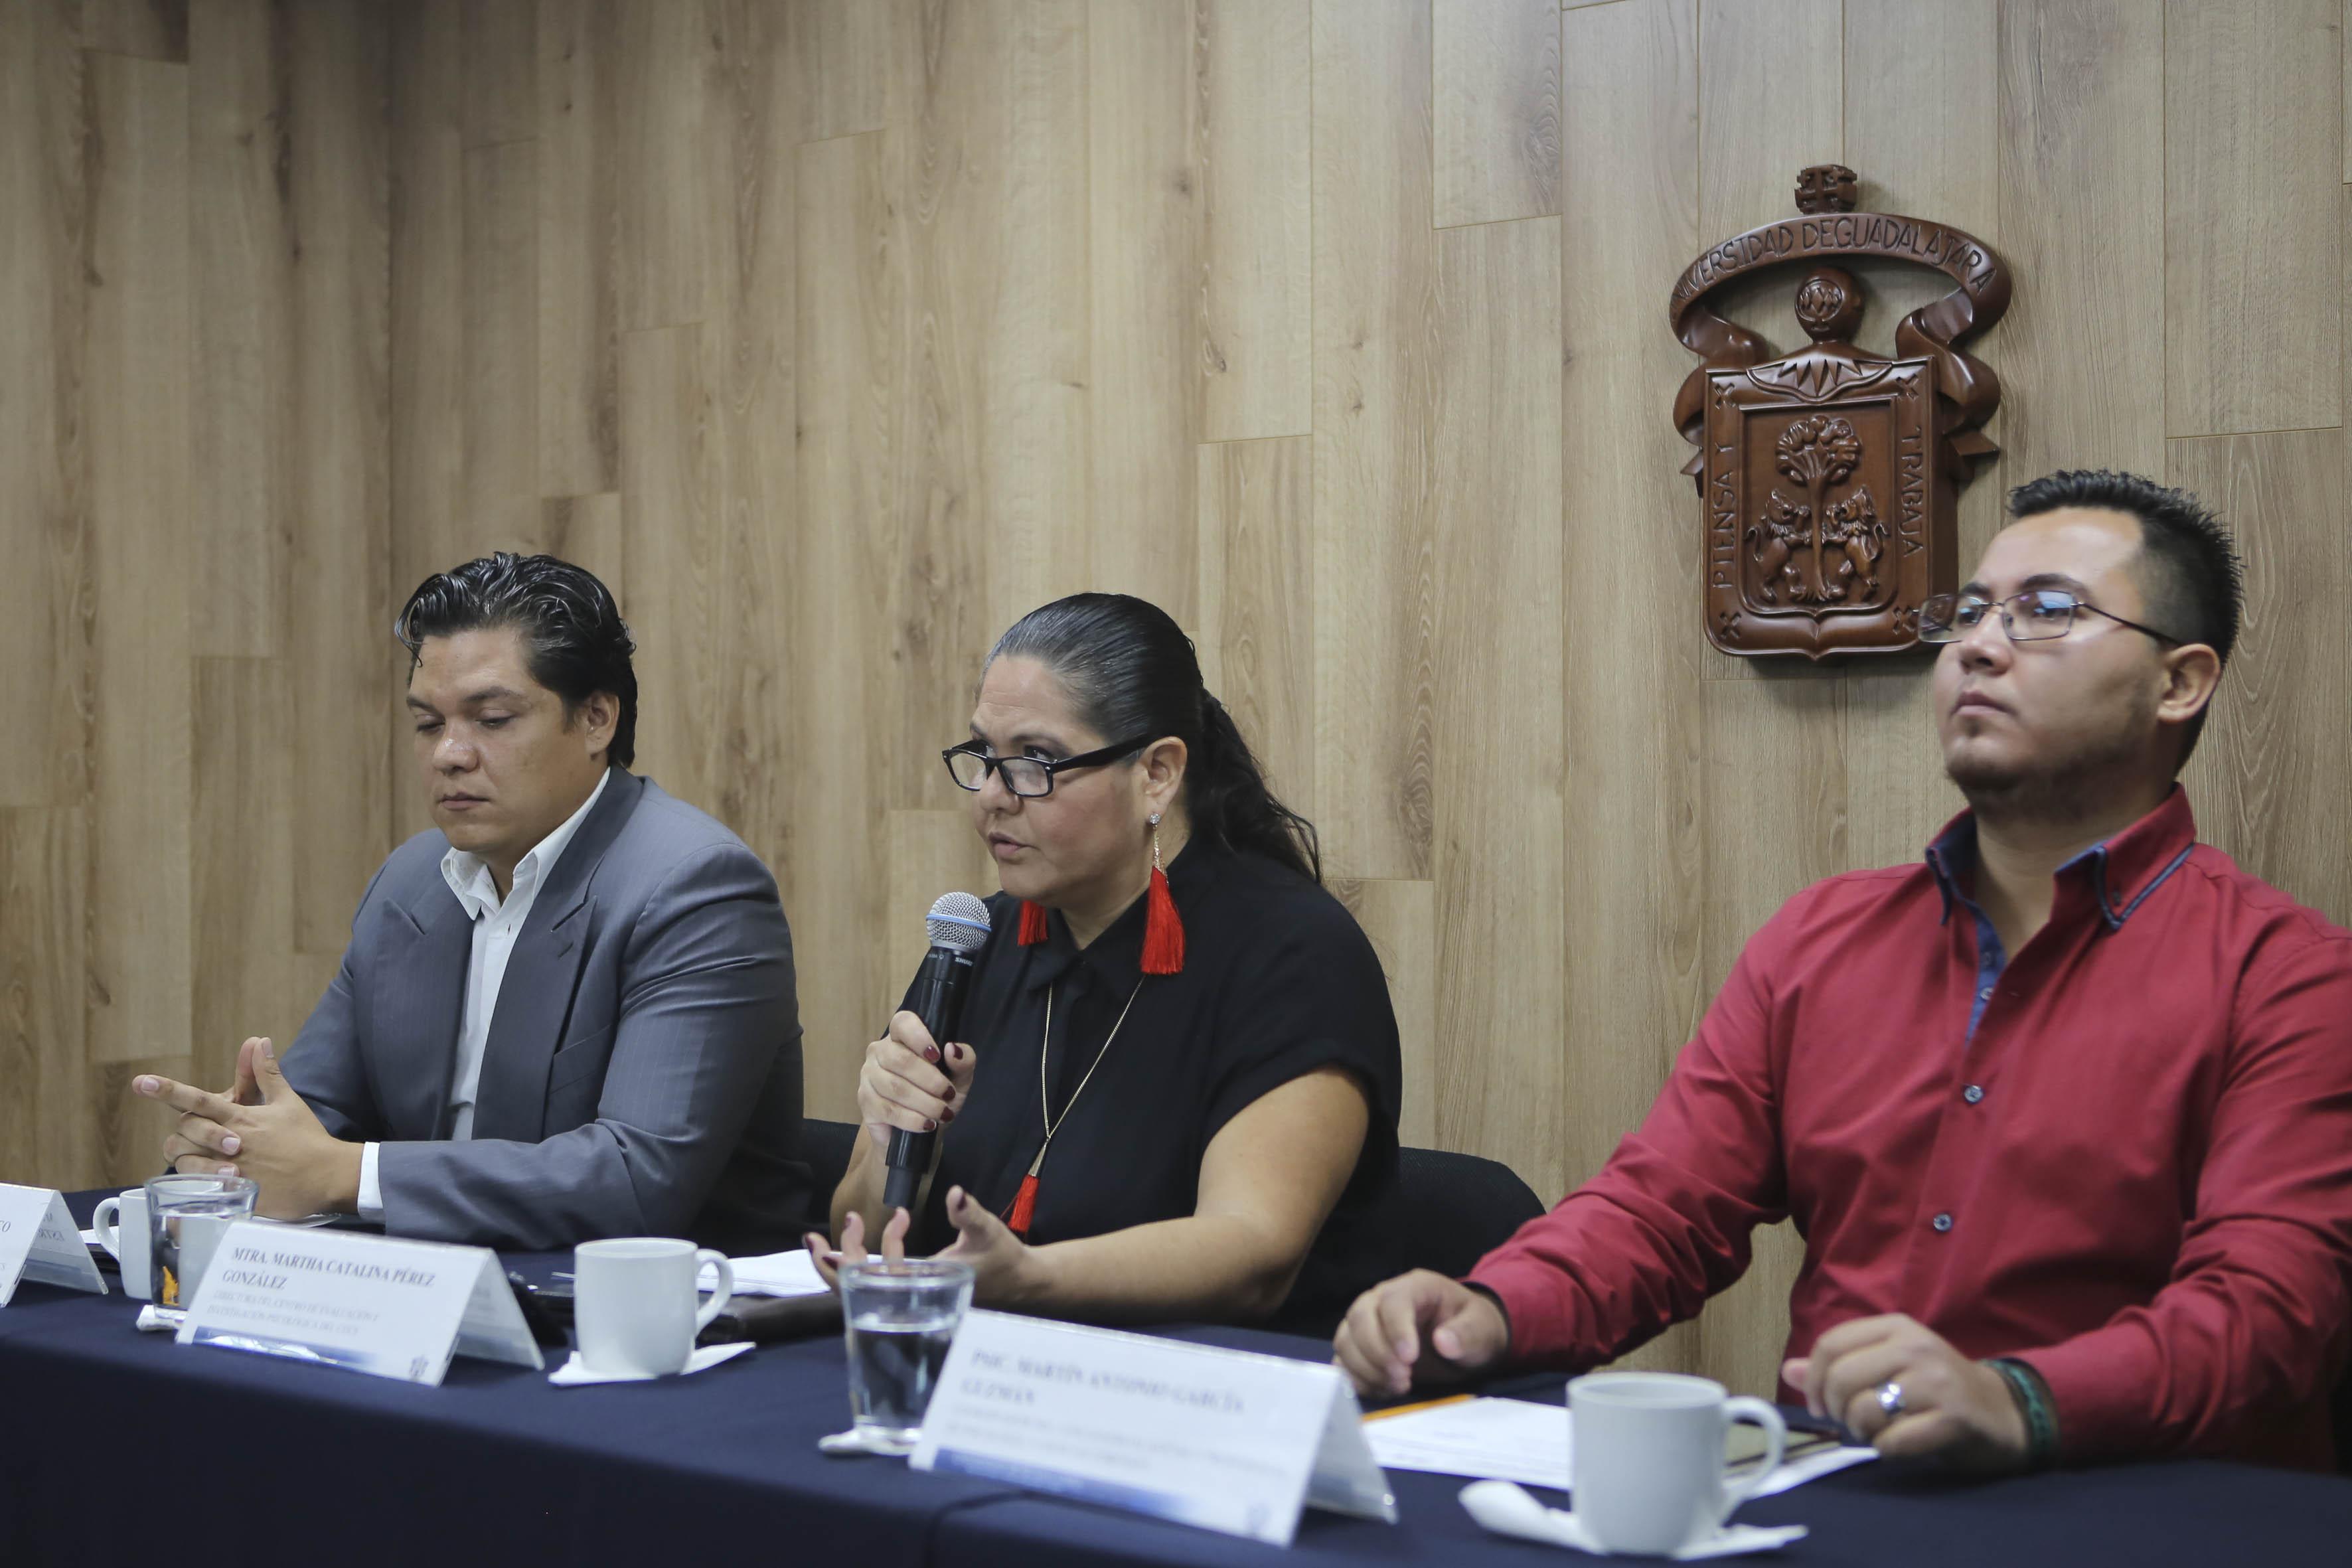 Mtra. Martha Catalina Pérez González tomando la palabra en rueda de prensa